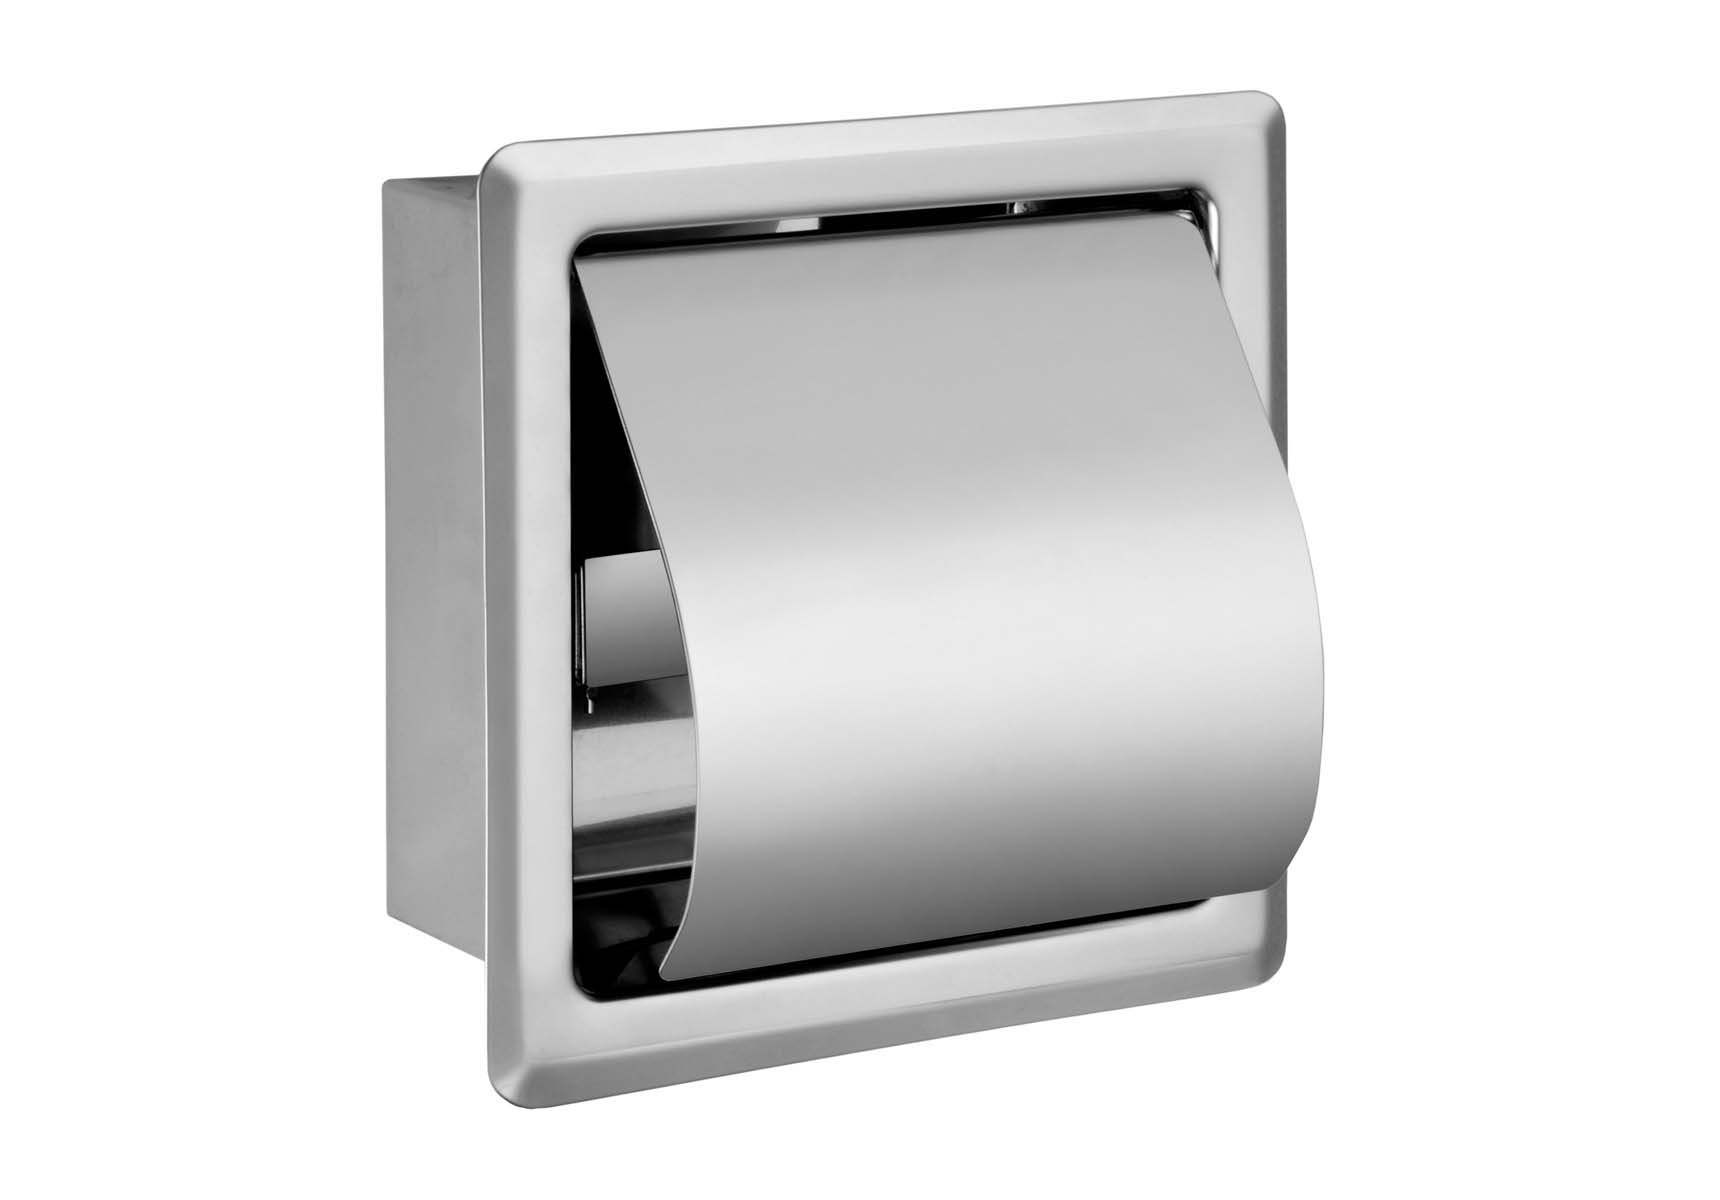 Arkitekta Built-in Roll Holder (Single)